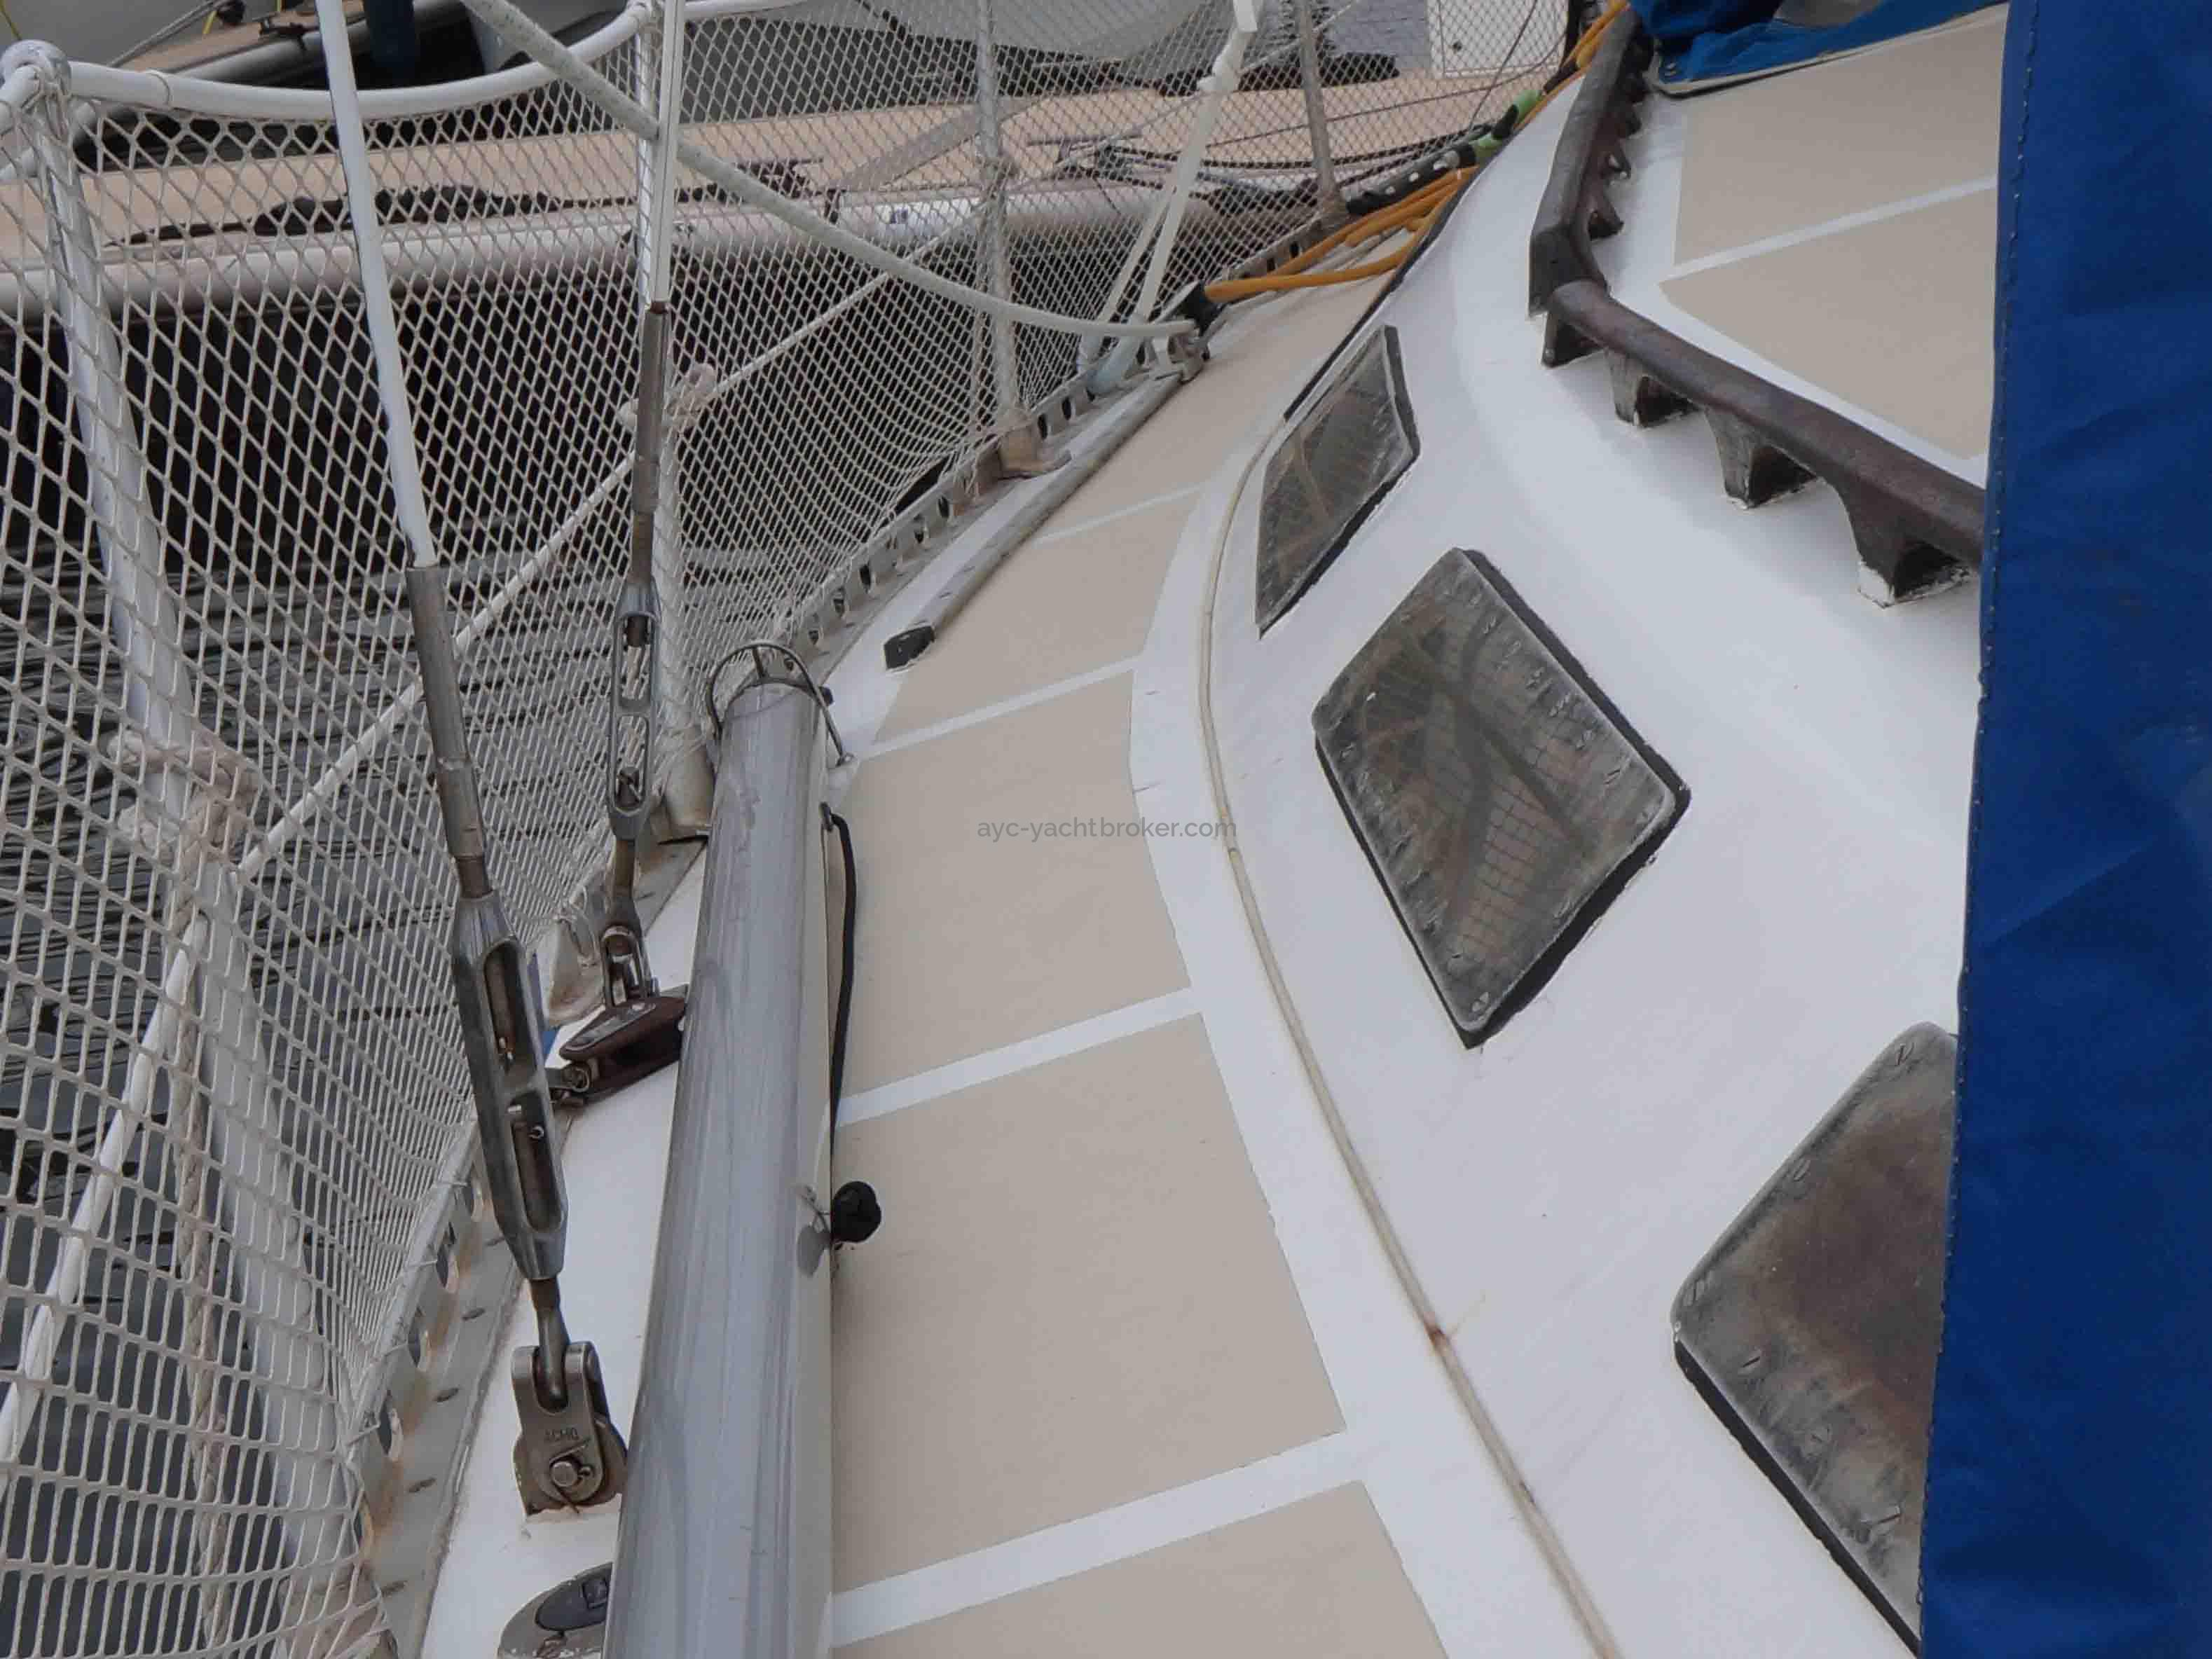 AYC YachtBroker - Pont